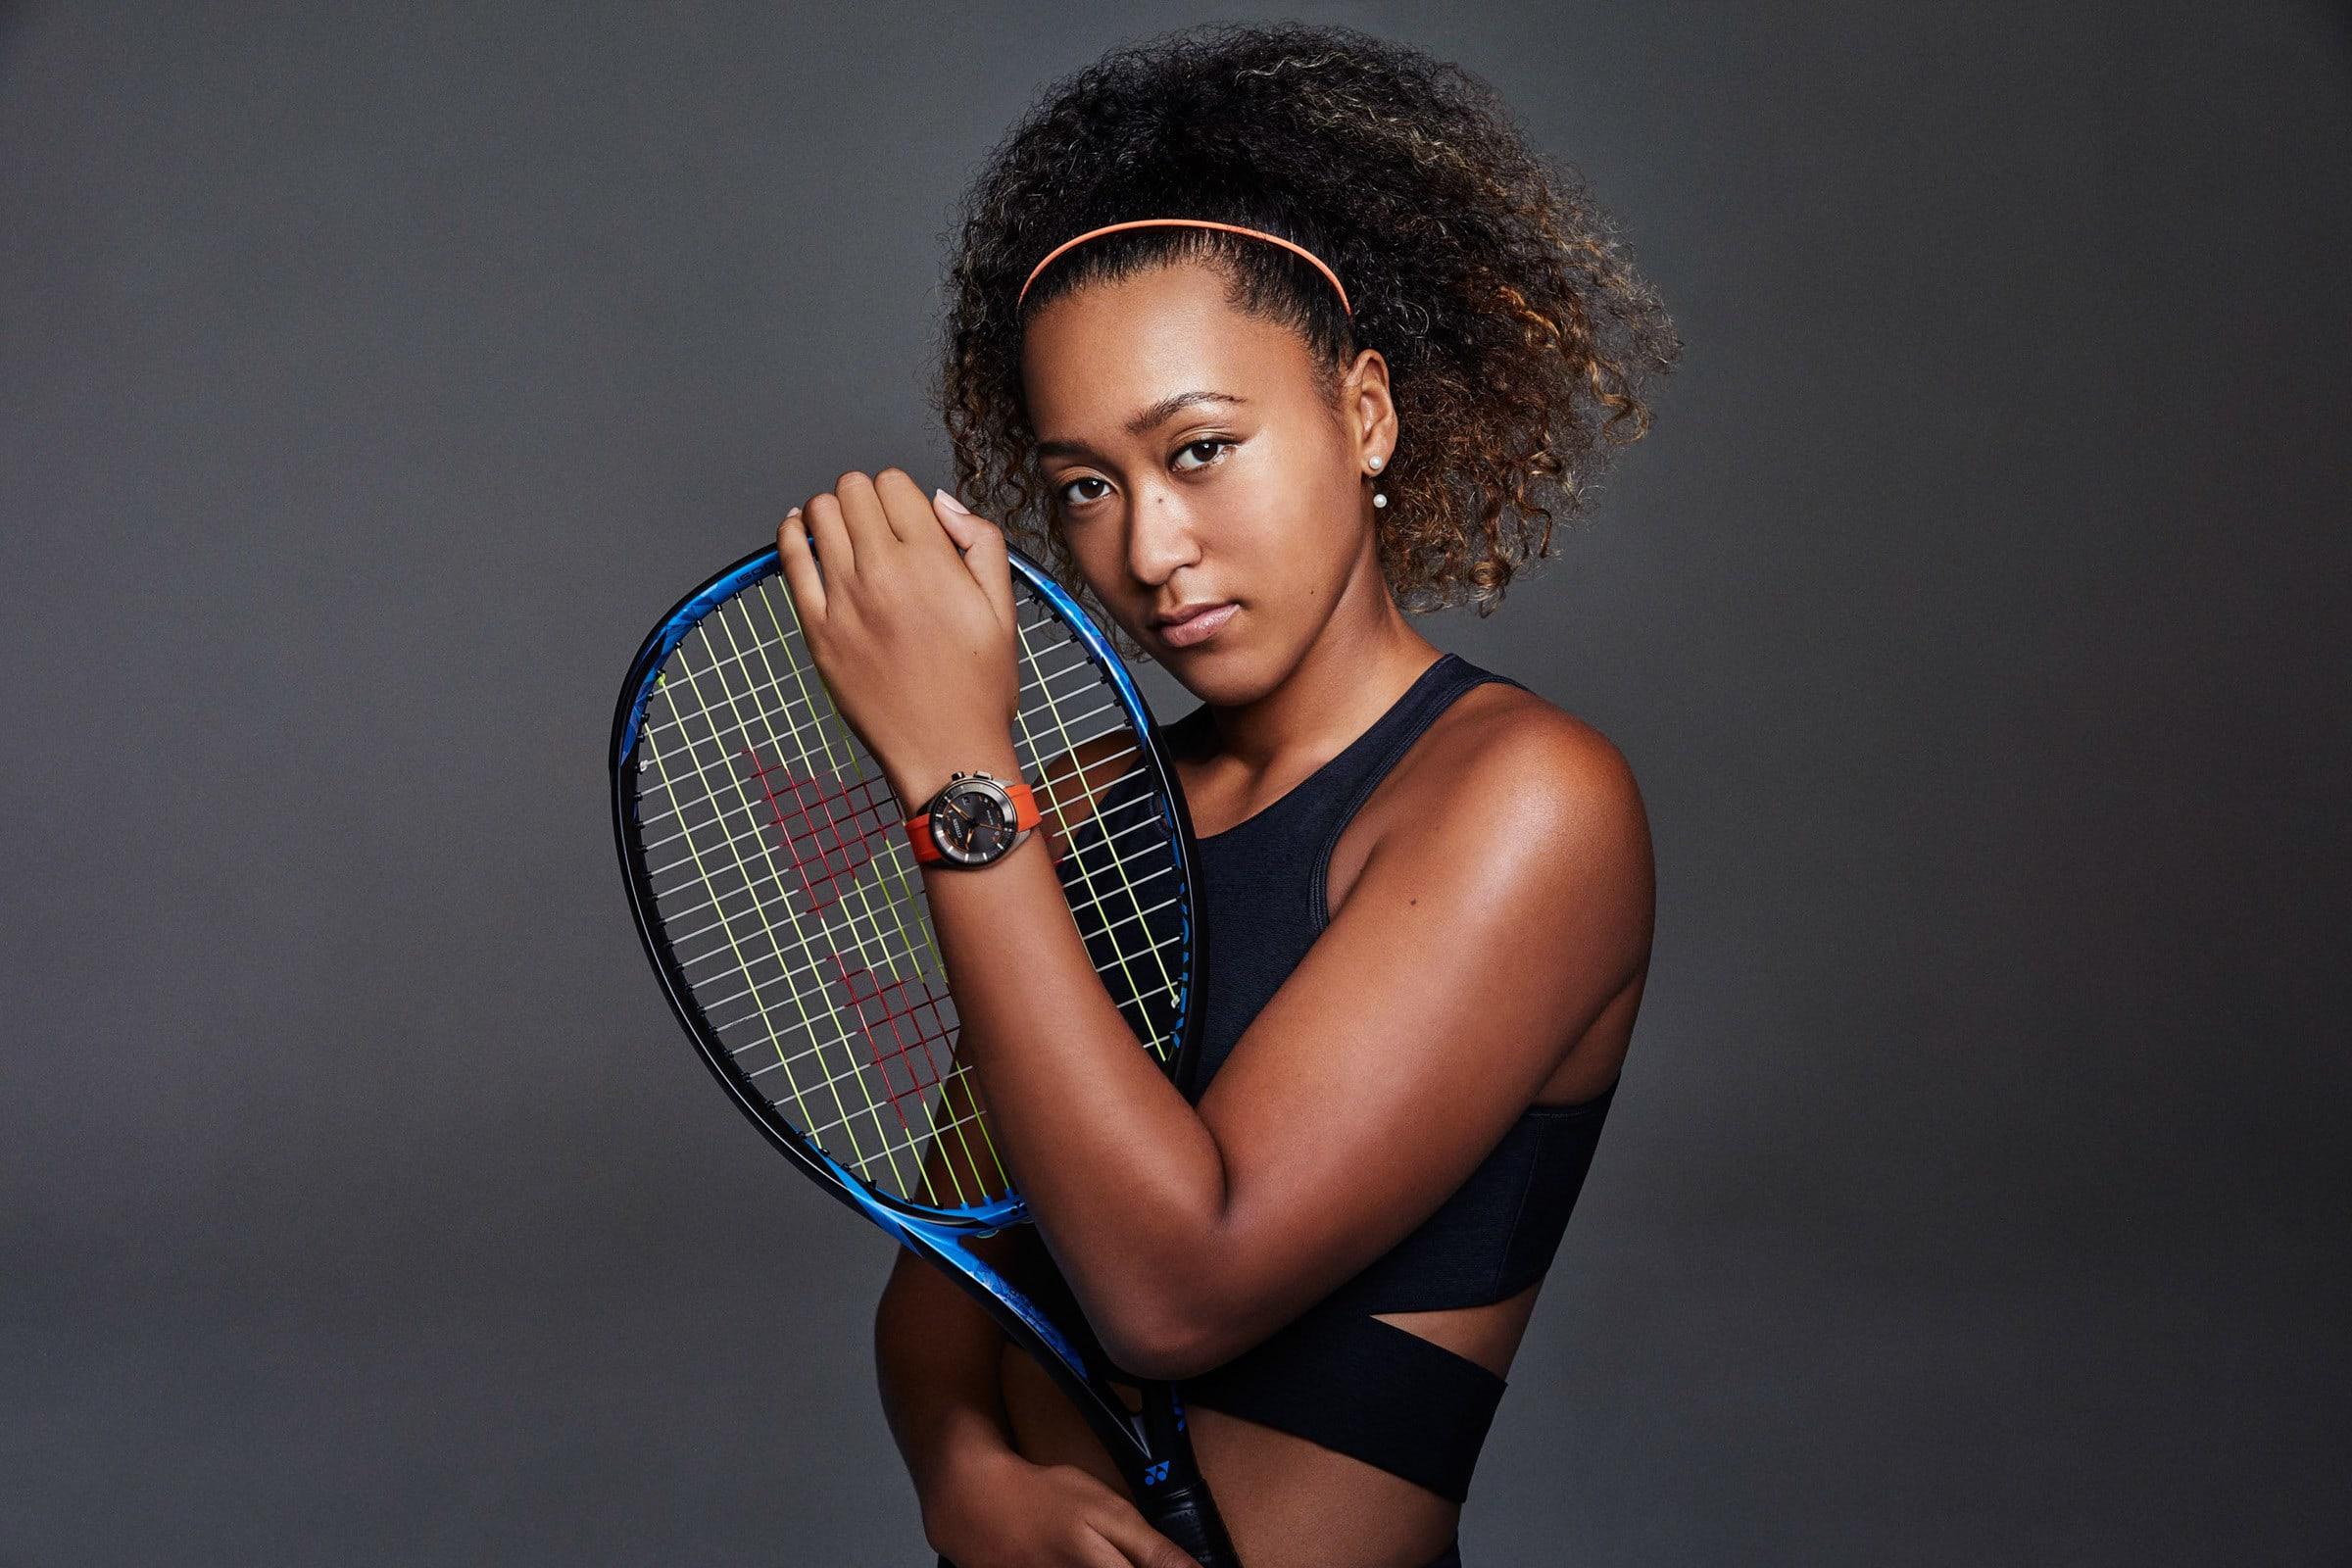 cb425ae90e シチズン時計が、ブランドアンバサダーを務めているプロテニスプレーヤー大坂なおみ選手が1月15日開幕の全豪オープンテニスの試合で着用するアナログ腕時計「シチズン  ...